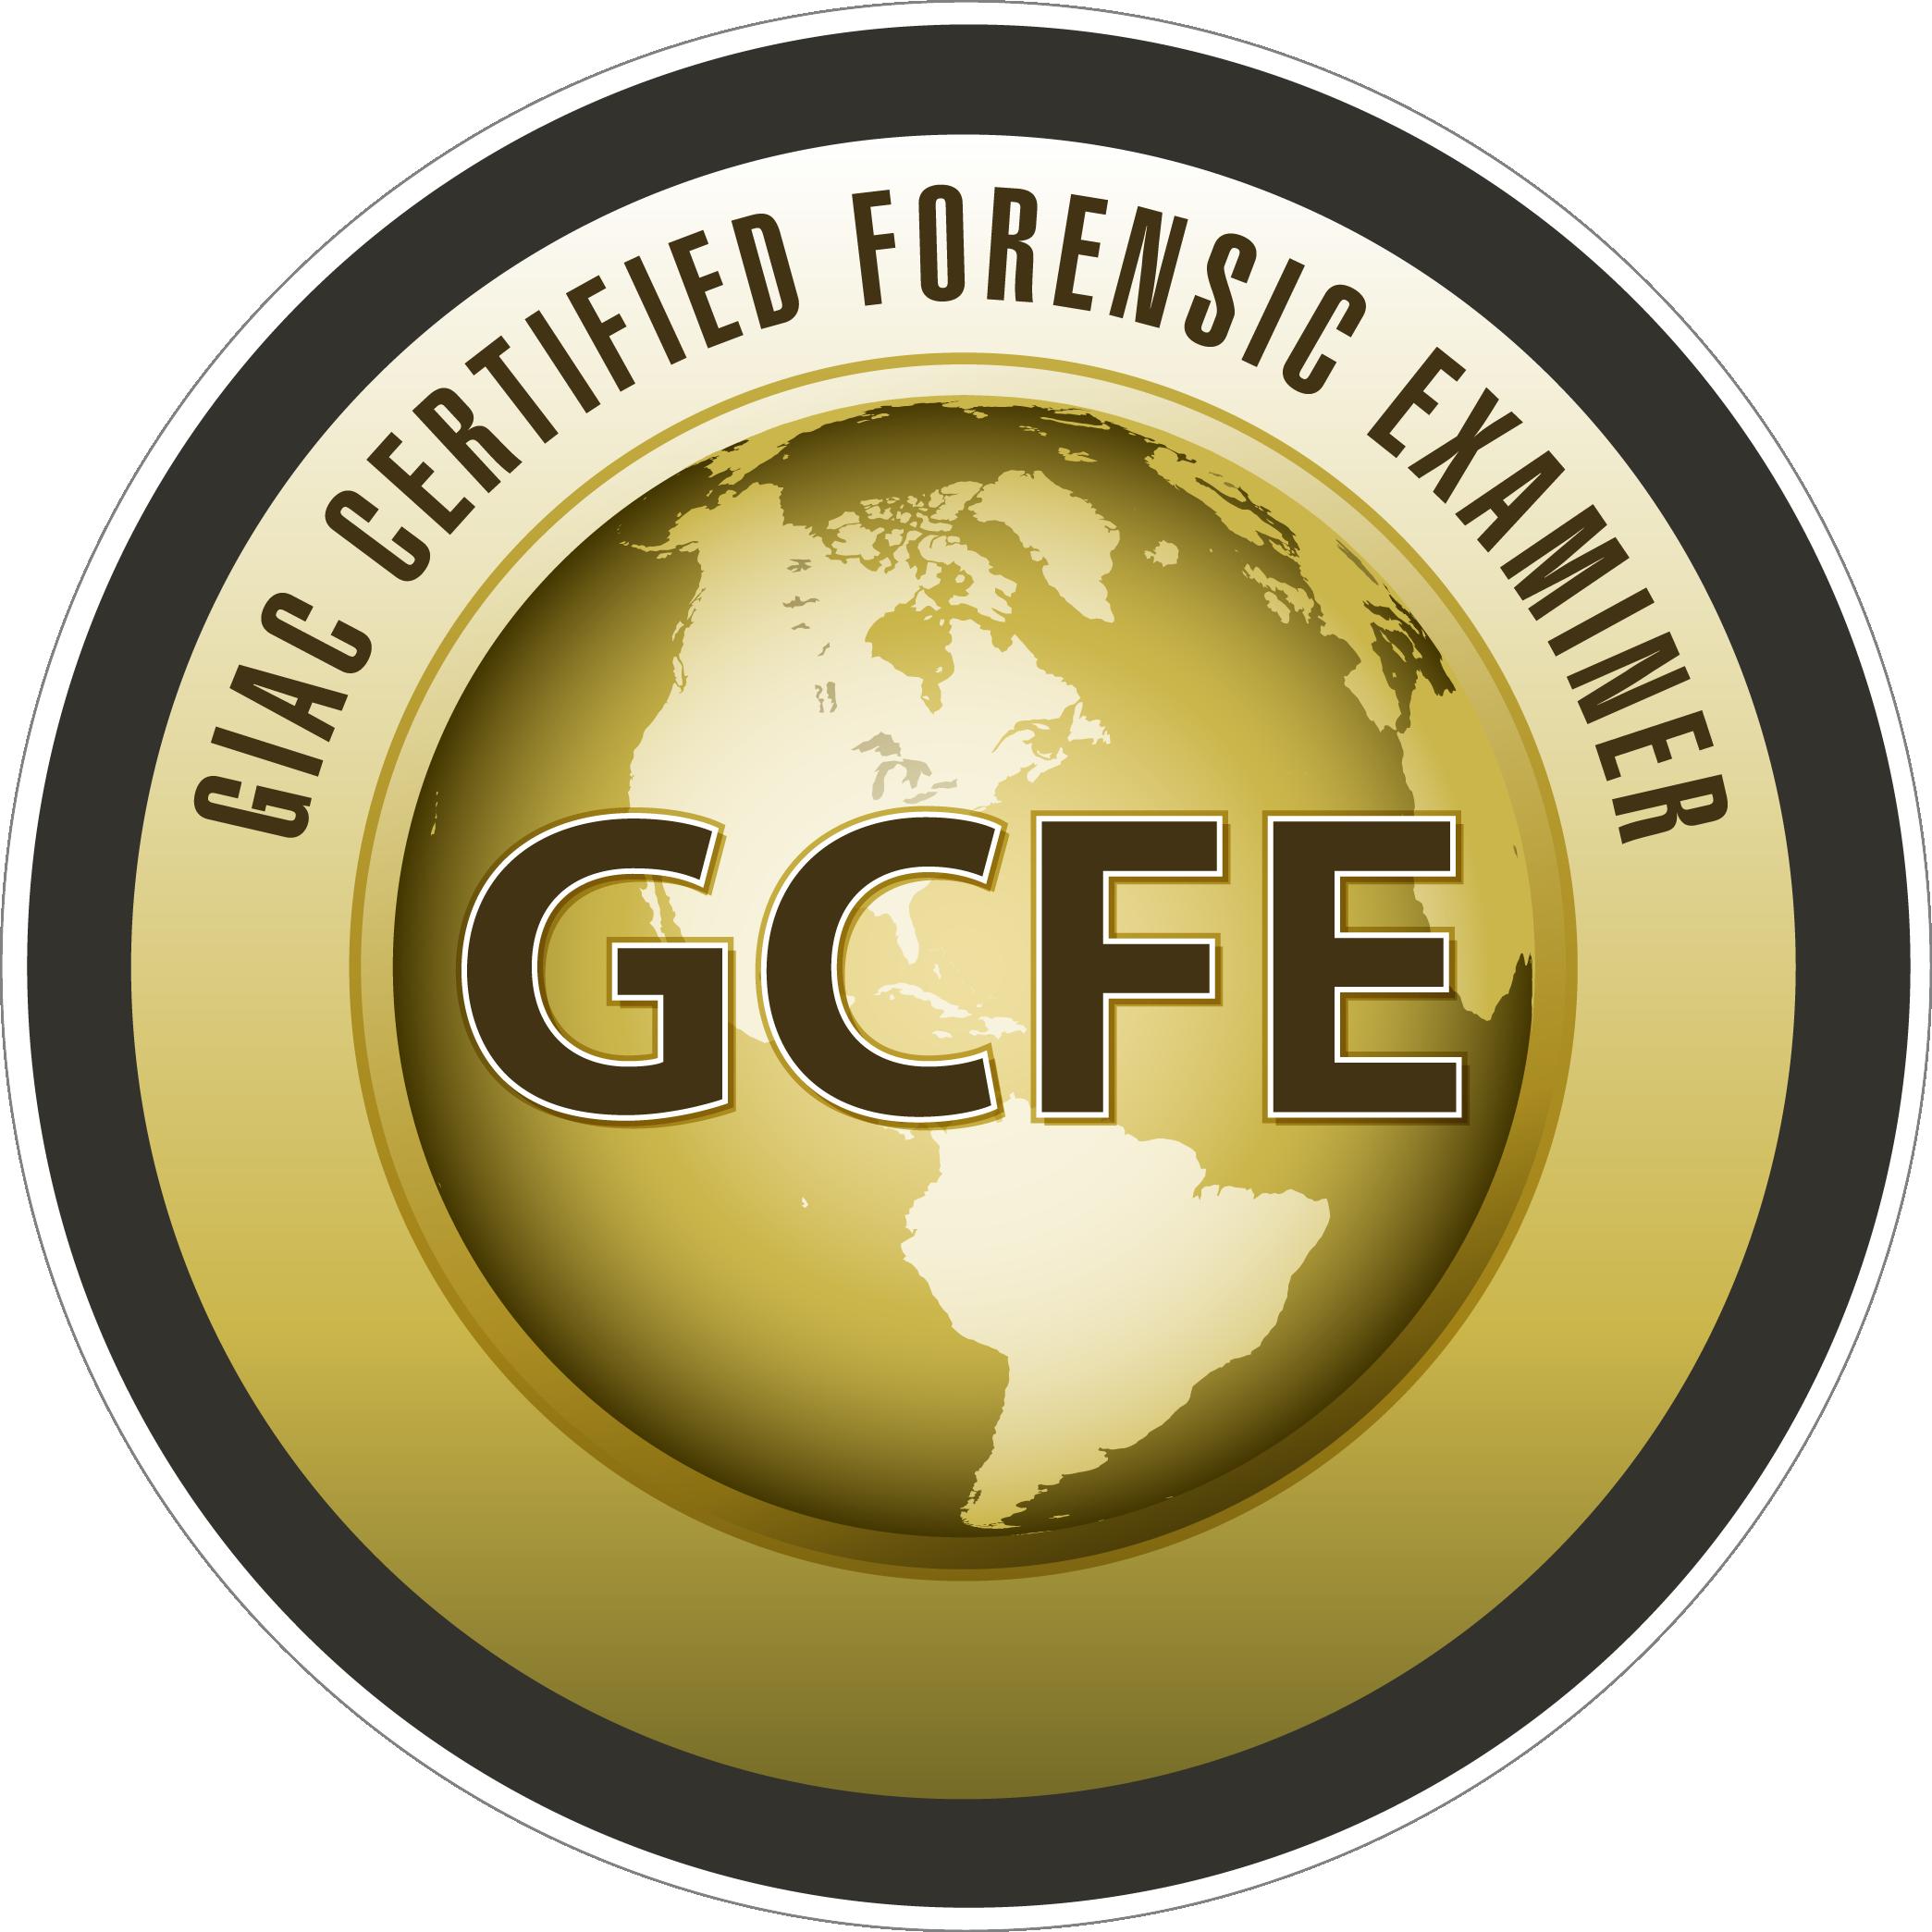 GIAC Certified Forensic Examiner (GCFE) icon